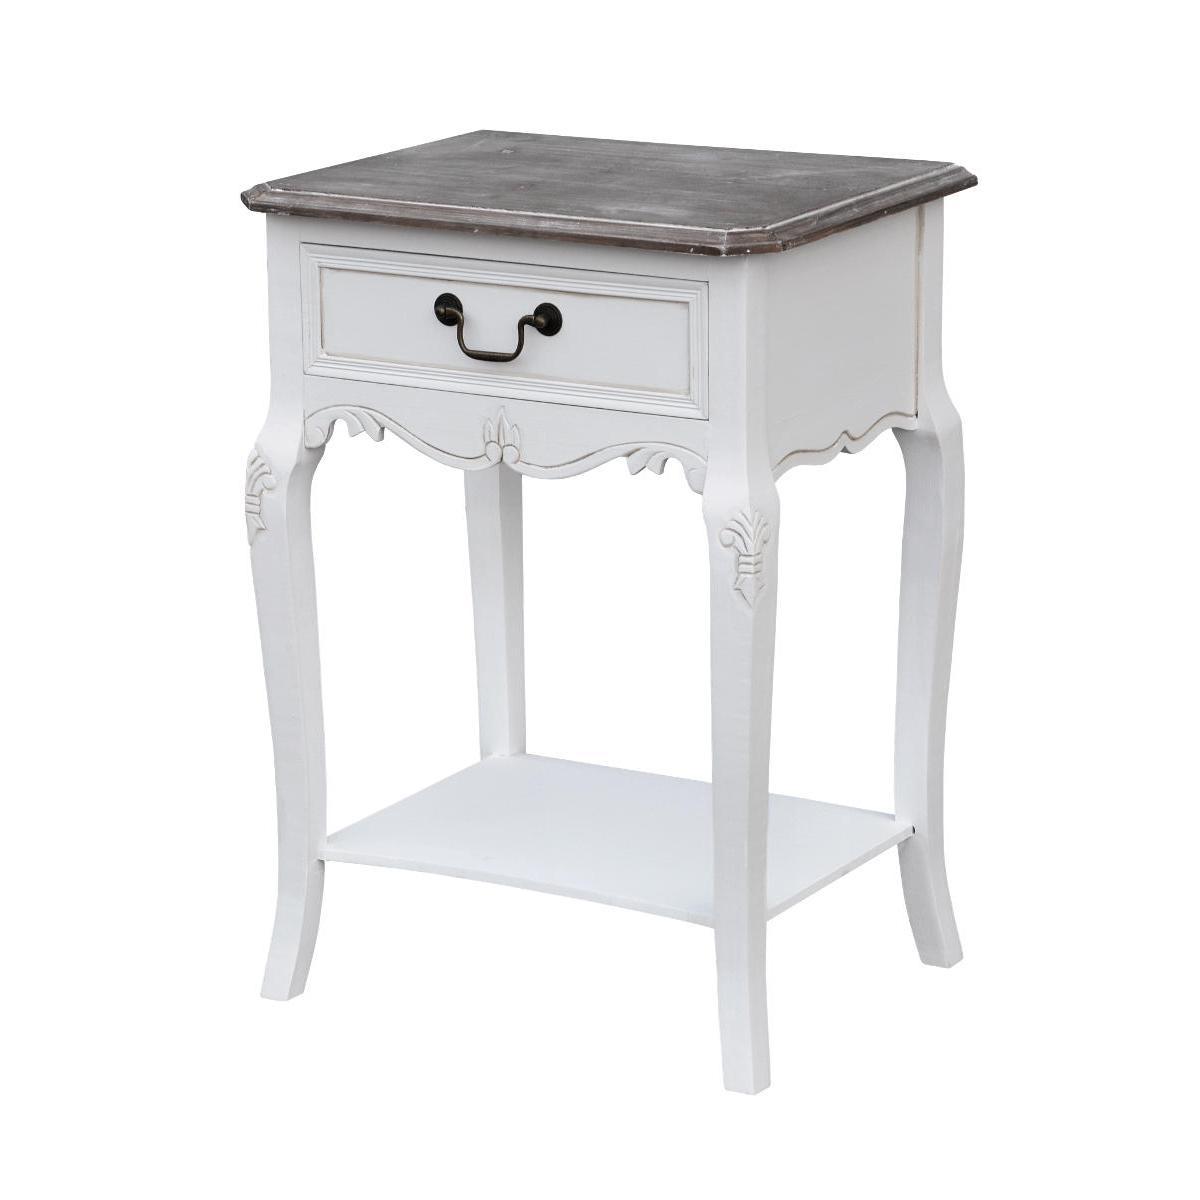 Cabinet din lemn de plop si MDF, cu 1 sertar Rimini White RI019W White / Brown, l47xA36xH70 cm